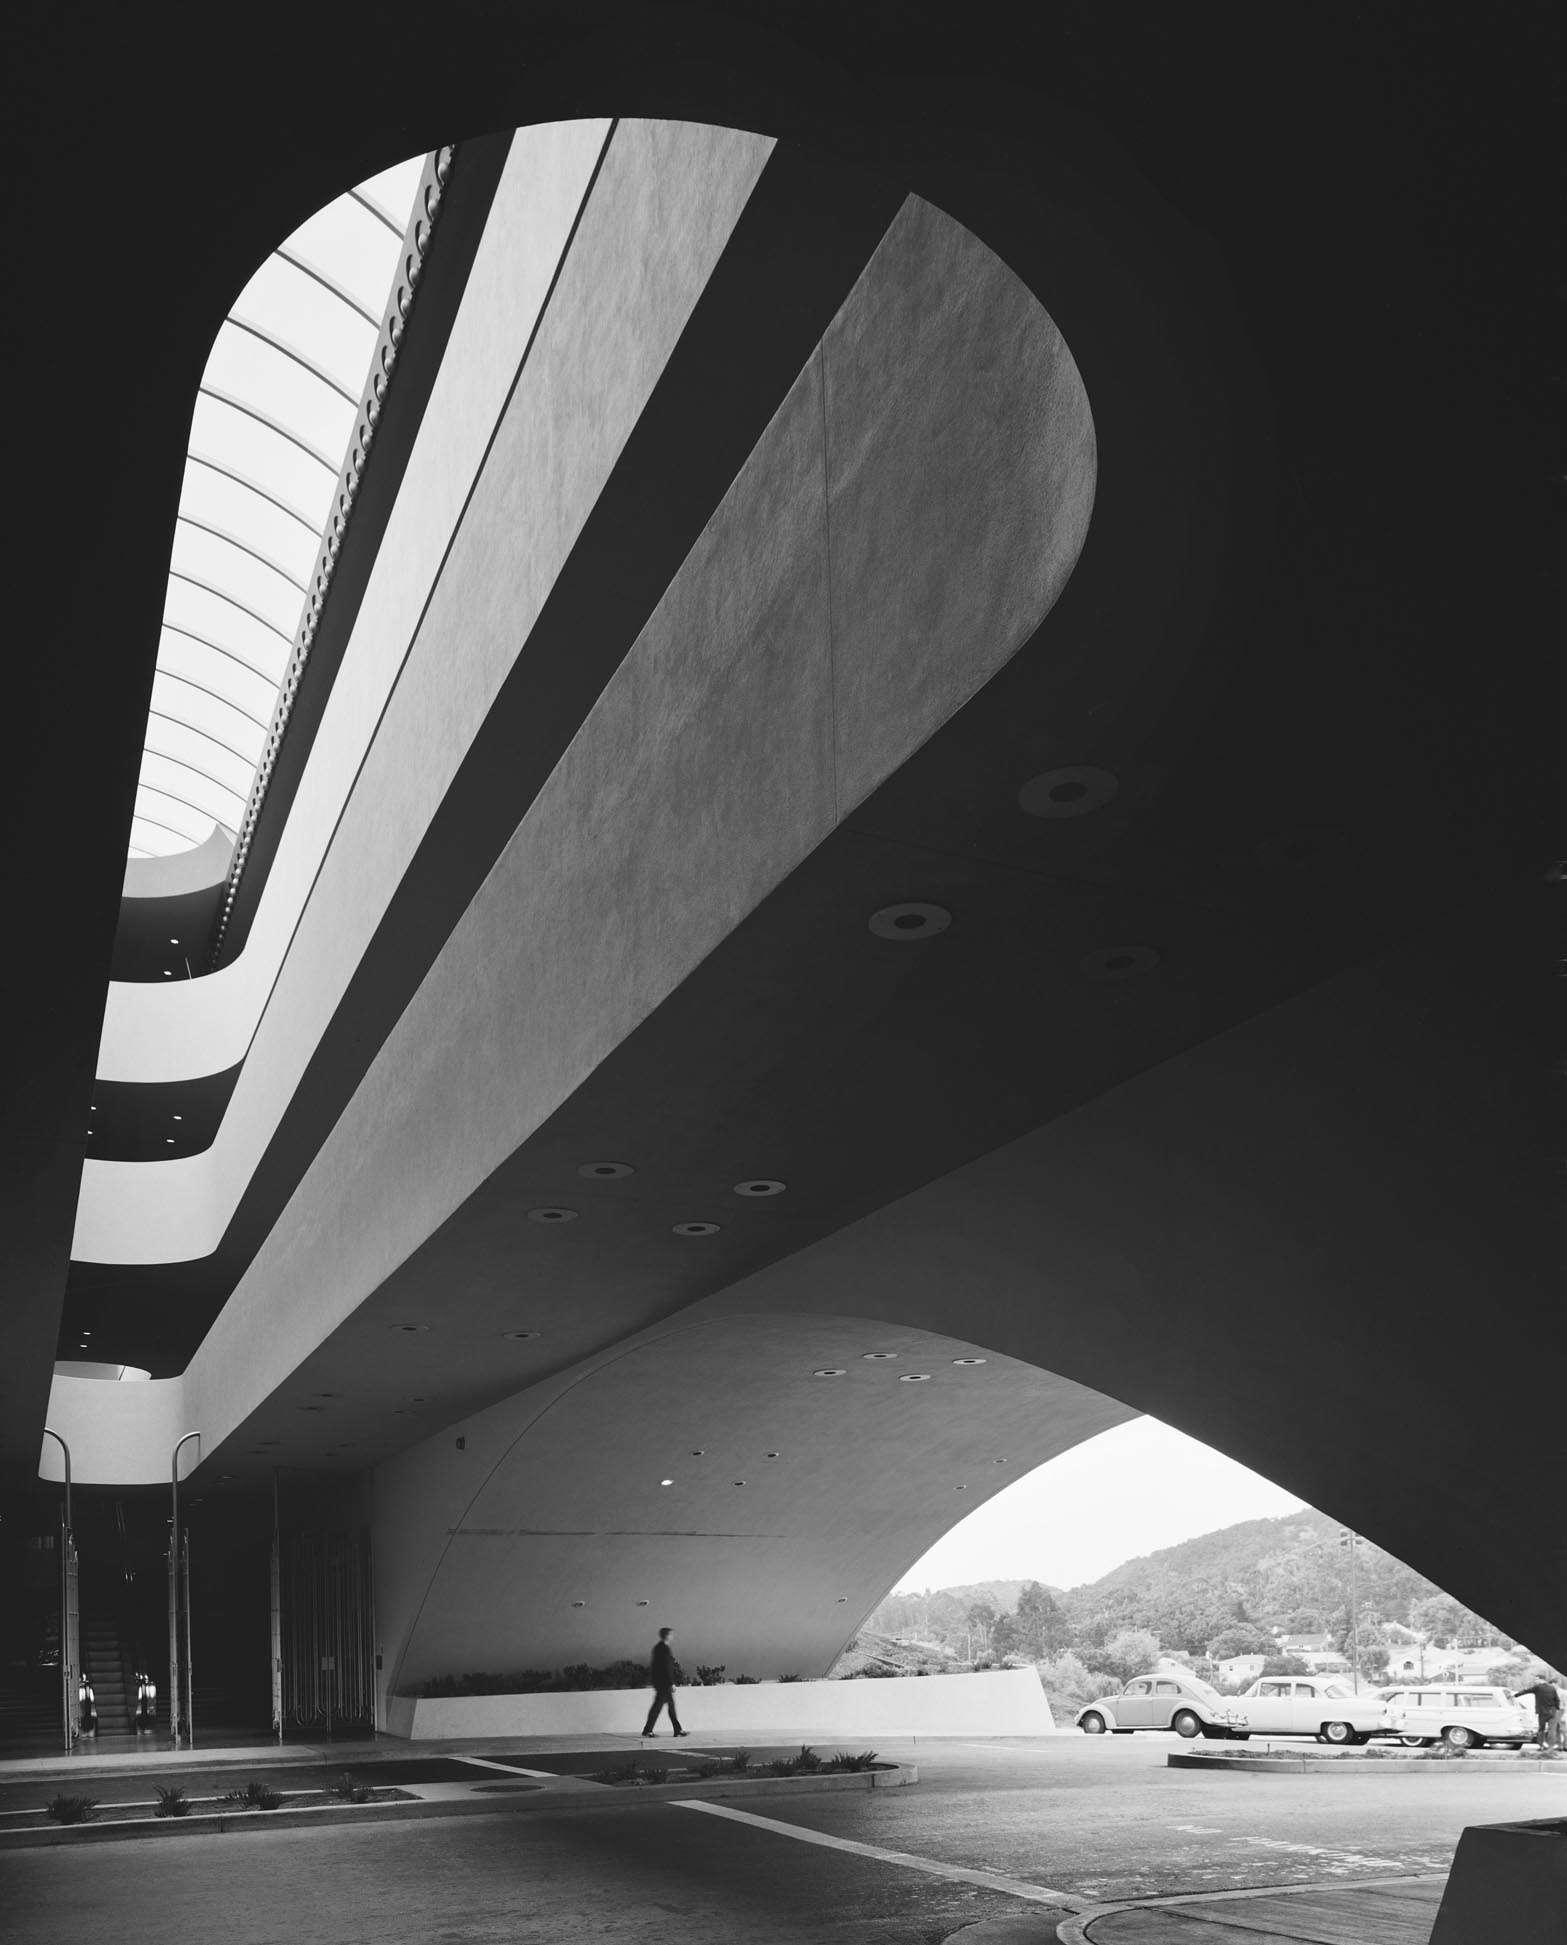 Marin County Civic Center in San Rafael, California by Frank Lloyd Wright